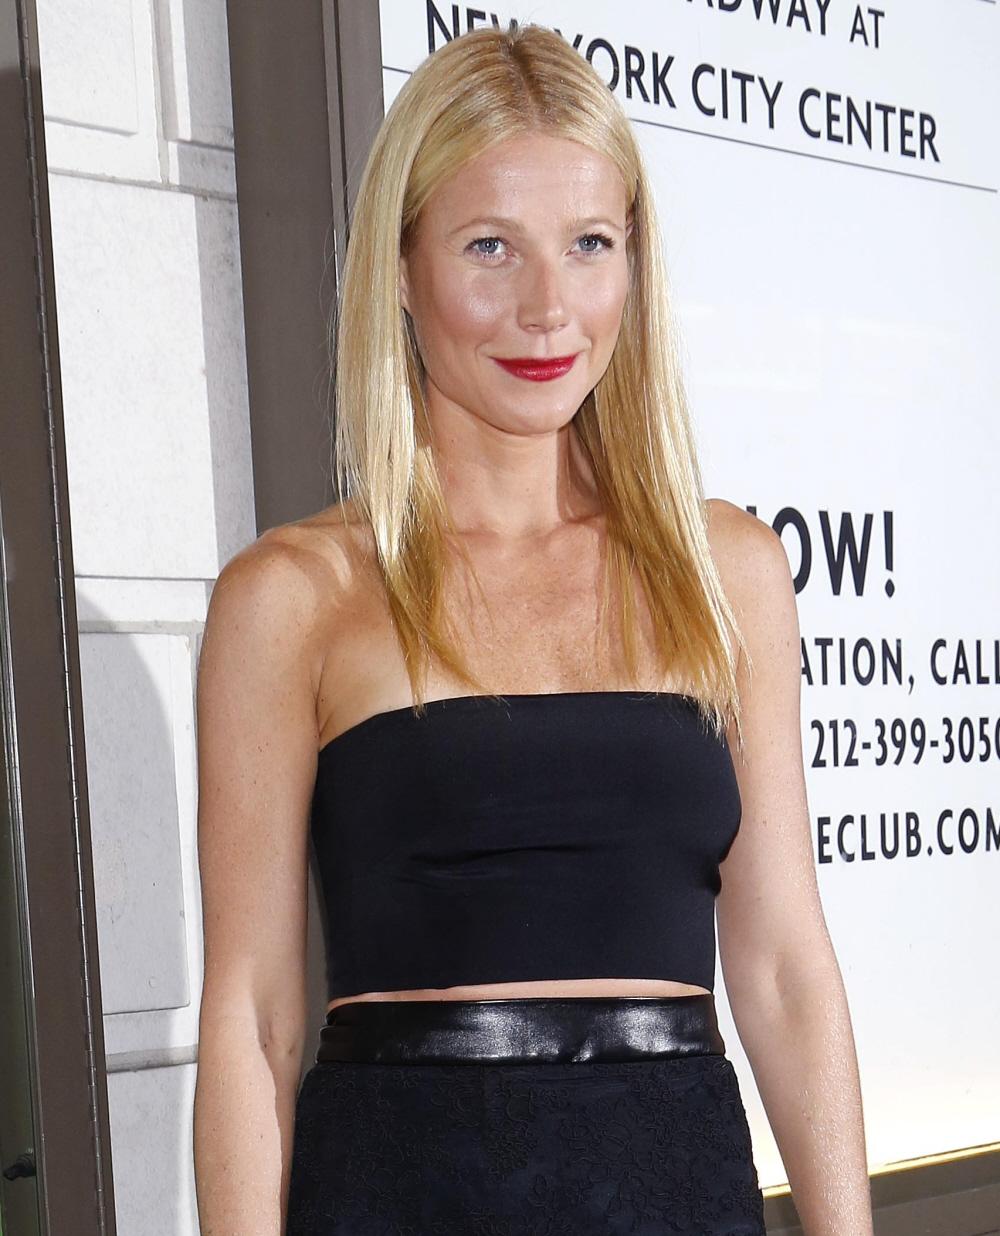 Is Gwyneth Paltrow feeling smug about Chris Martin & J-Law's split?  Probably.